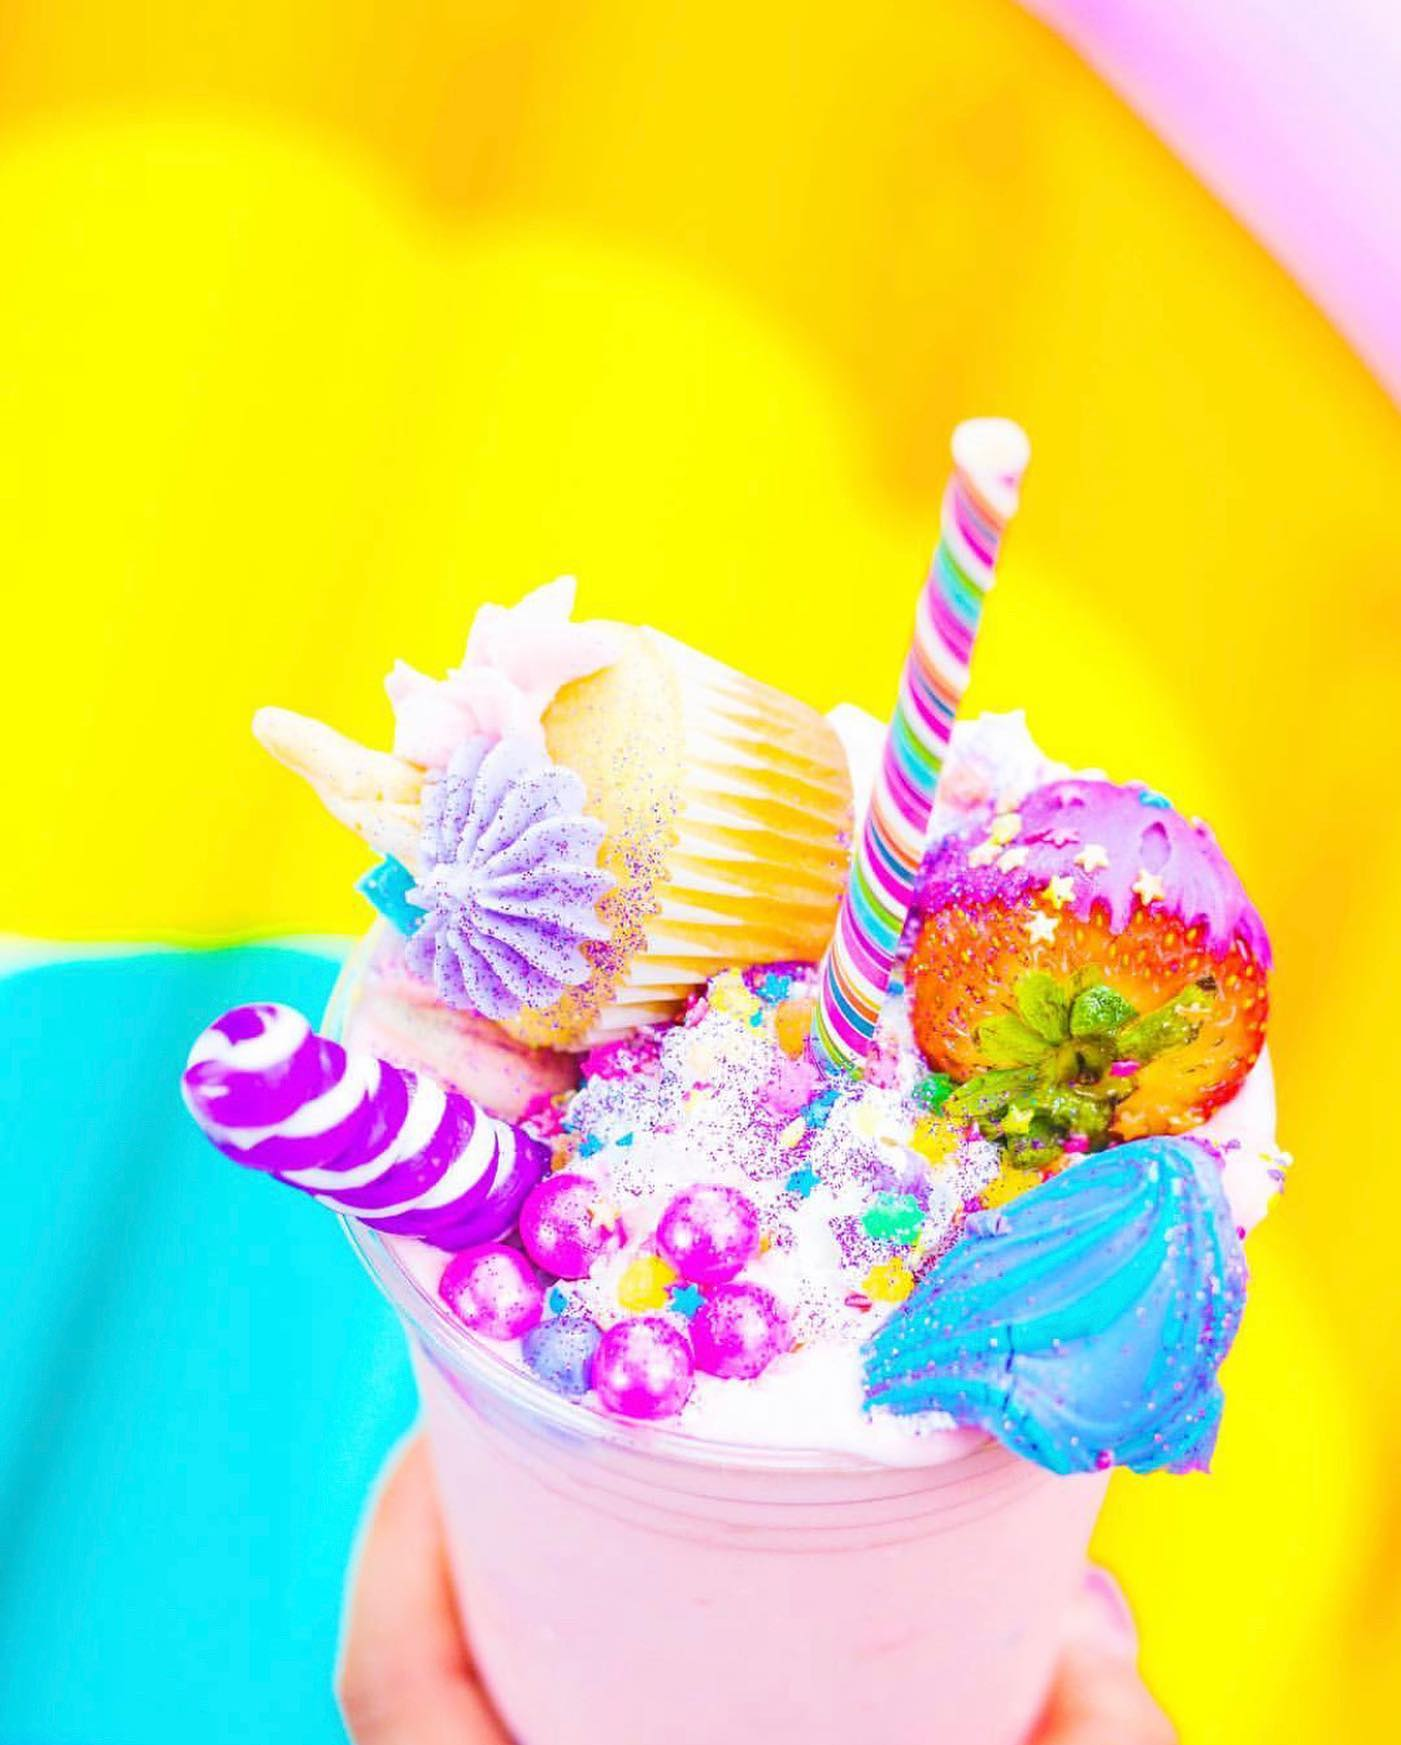 San Antonio's Whimsical Dessert Pop-Up Is Coming to Austin